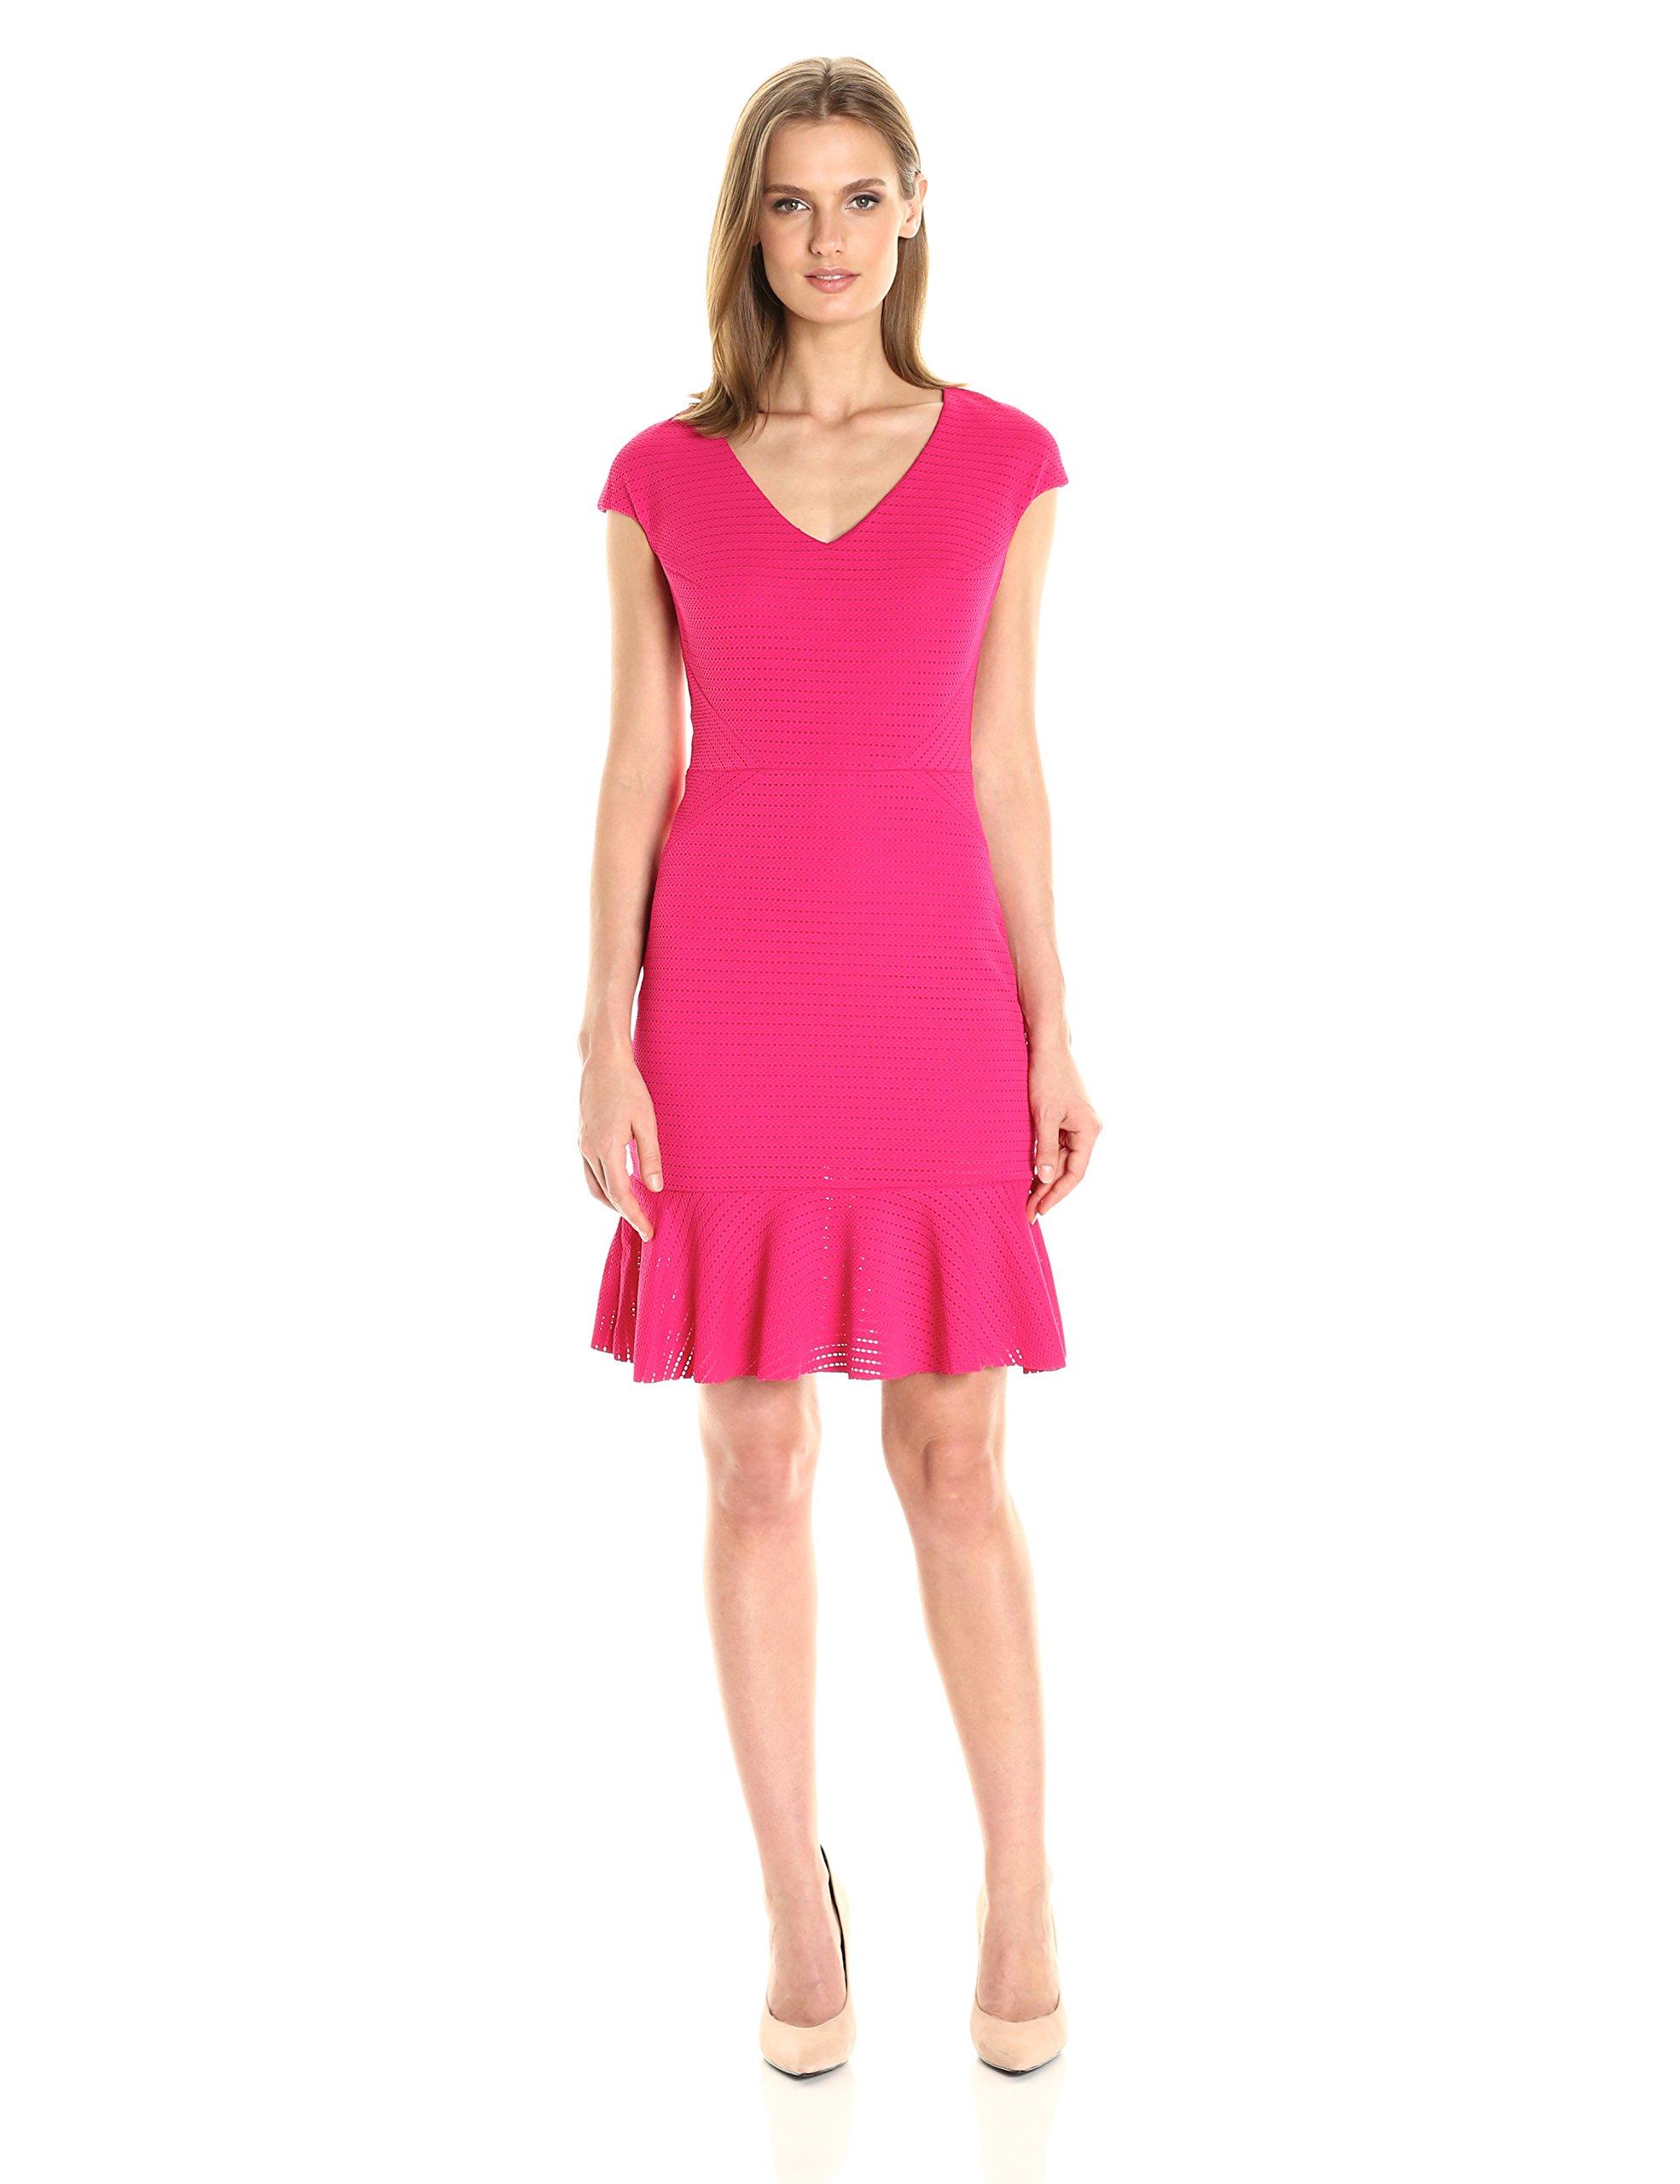 Julia Jordan Women's Fitted Sleeveless V Neck Dress with Flare at Bottom, Fuchsia, 2